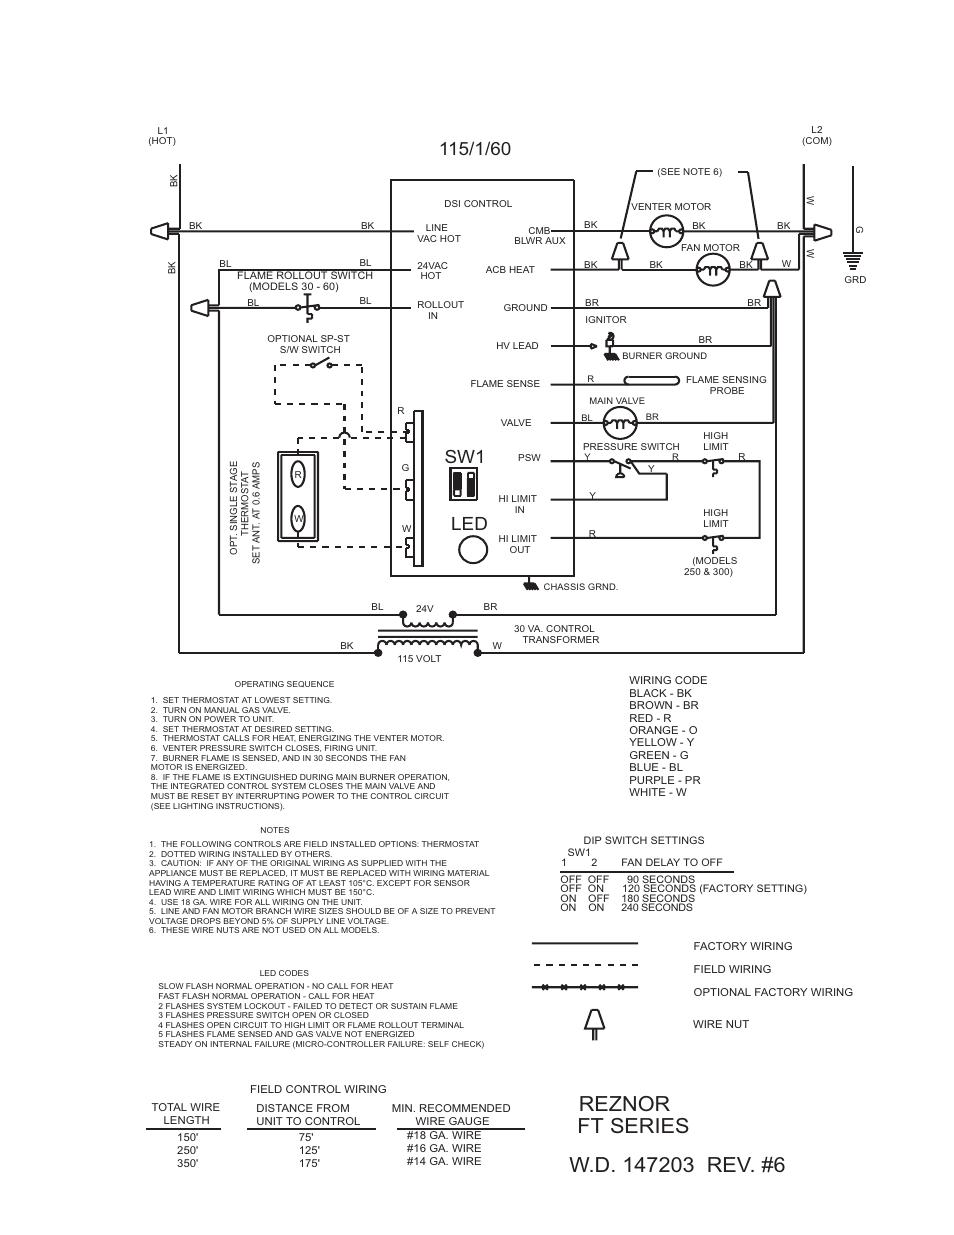 reznor ft unit installation manual page13?resize\\\\\\\\\\\\\\\\\\\\\\\\\\\\\\\\\\\\\\\\\\\\\\\\\\\\\\\\\\\\\\\=665%2C861 1756 ob16i manual wiring diagrams wiring diagrams  at alyssarenee.co